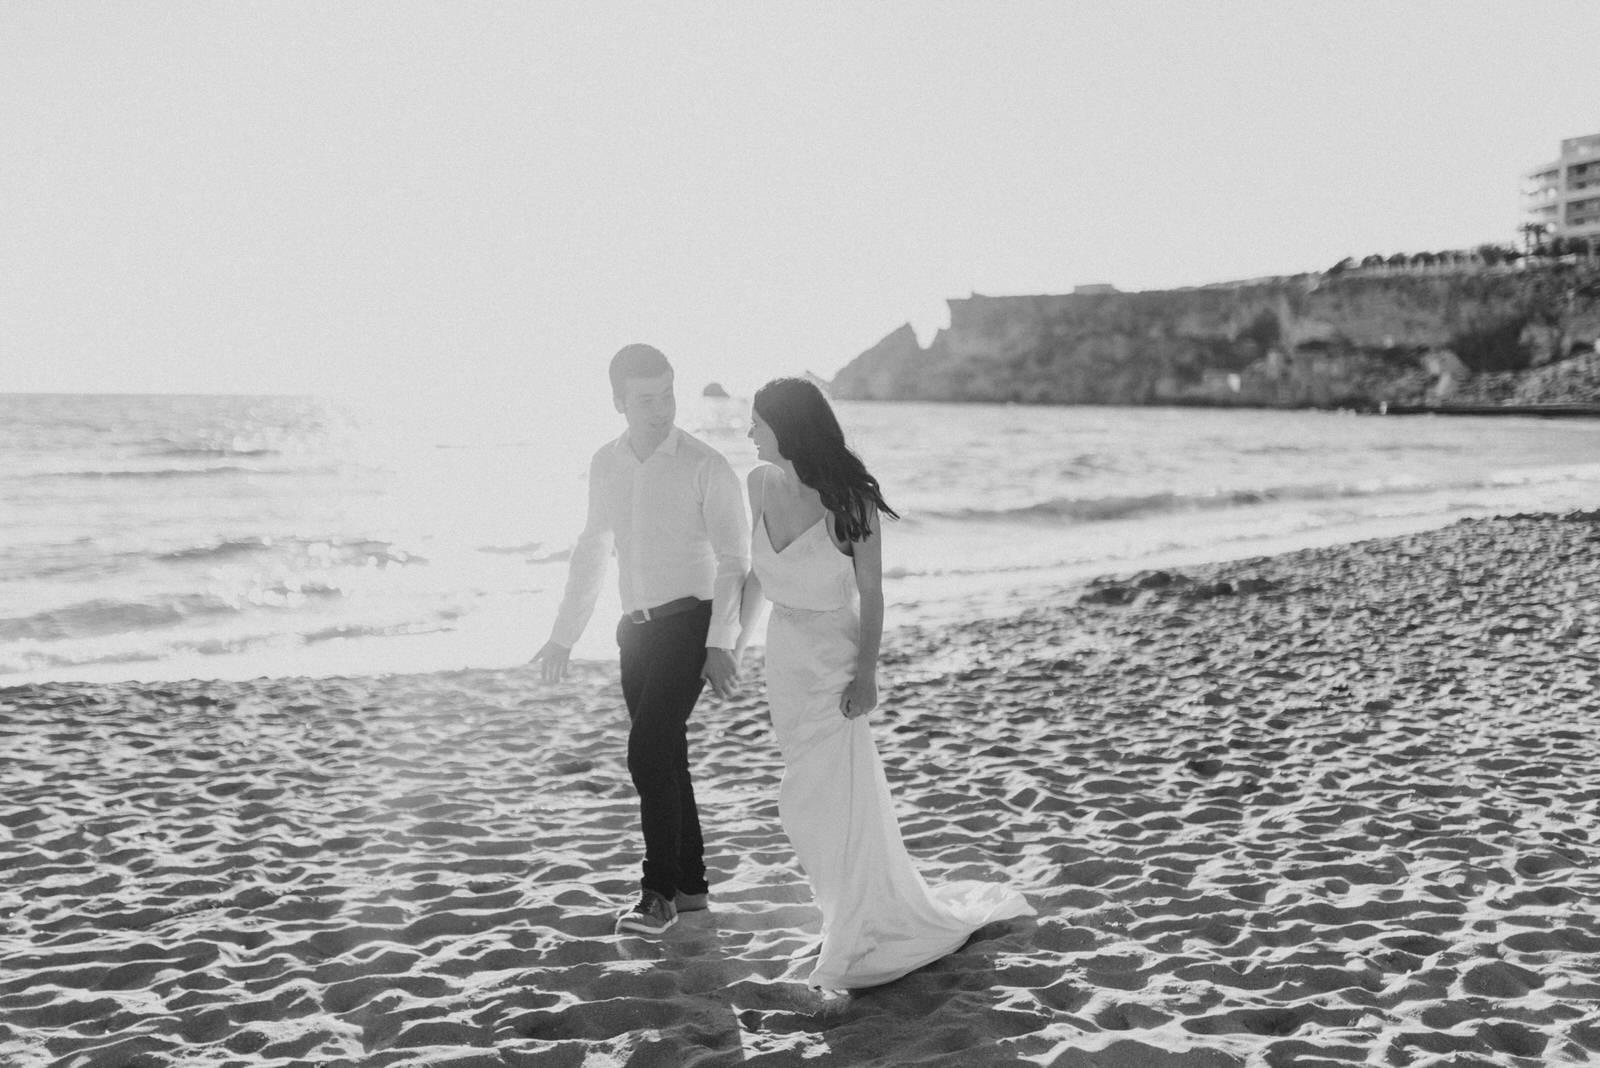 mdina wedding, malta wedding photography, malta elopement, golden bay malta wedding photos, wedding photographer malta, malta wedding venue, villa bologna wedding (74).jpg